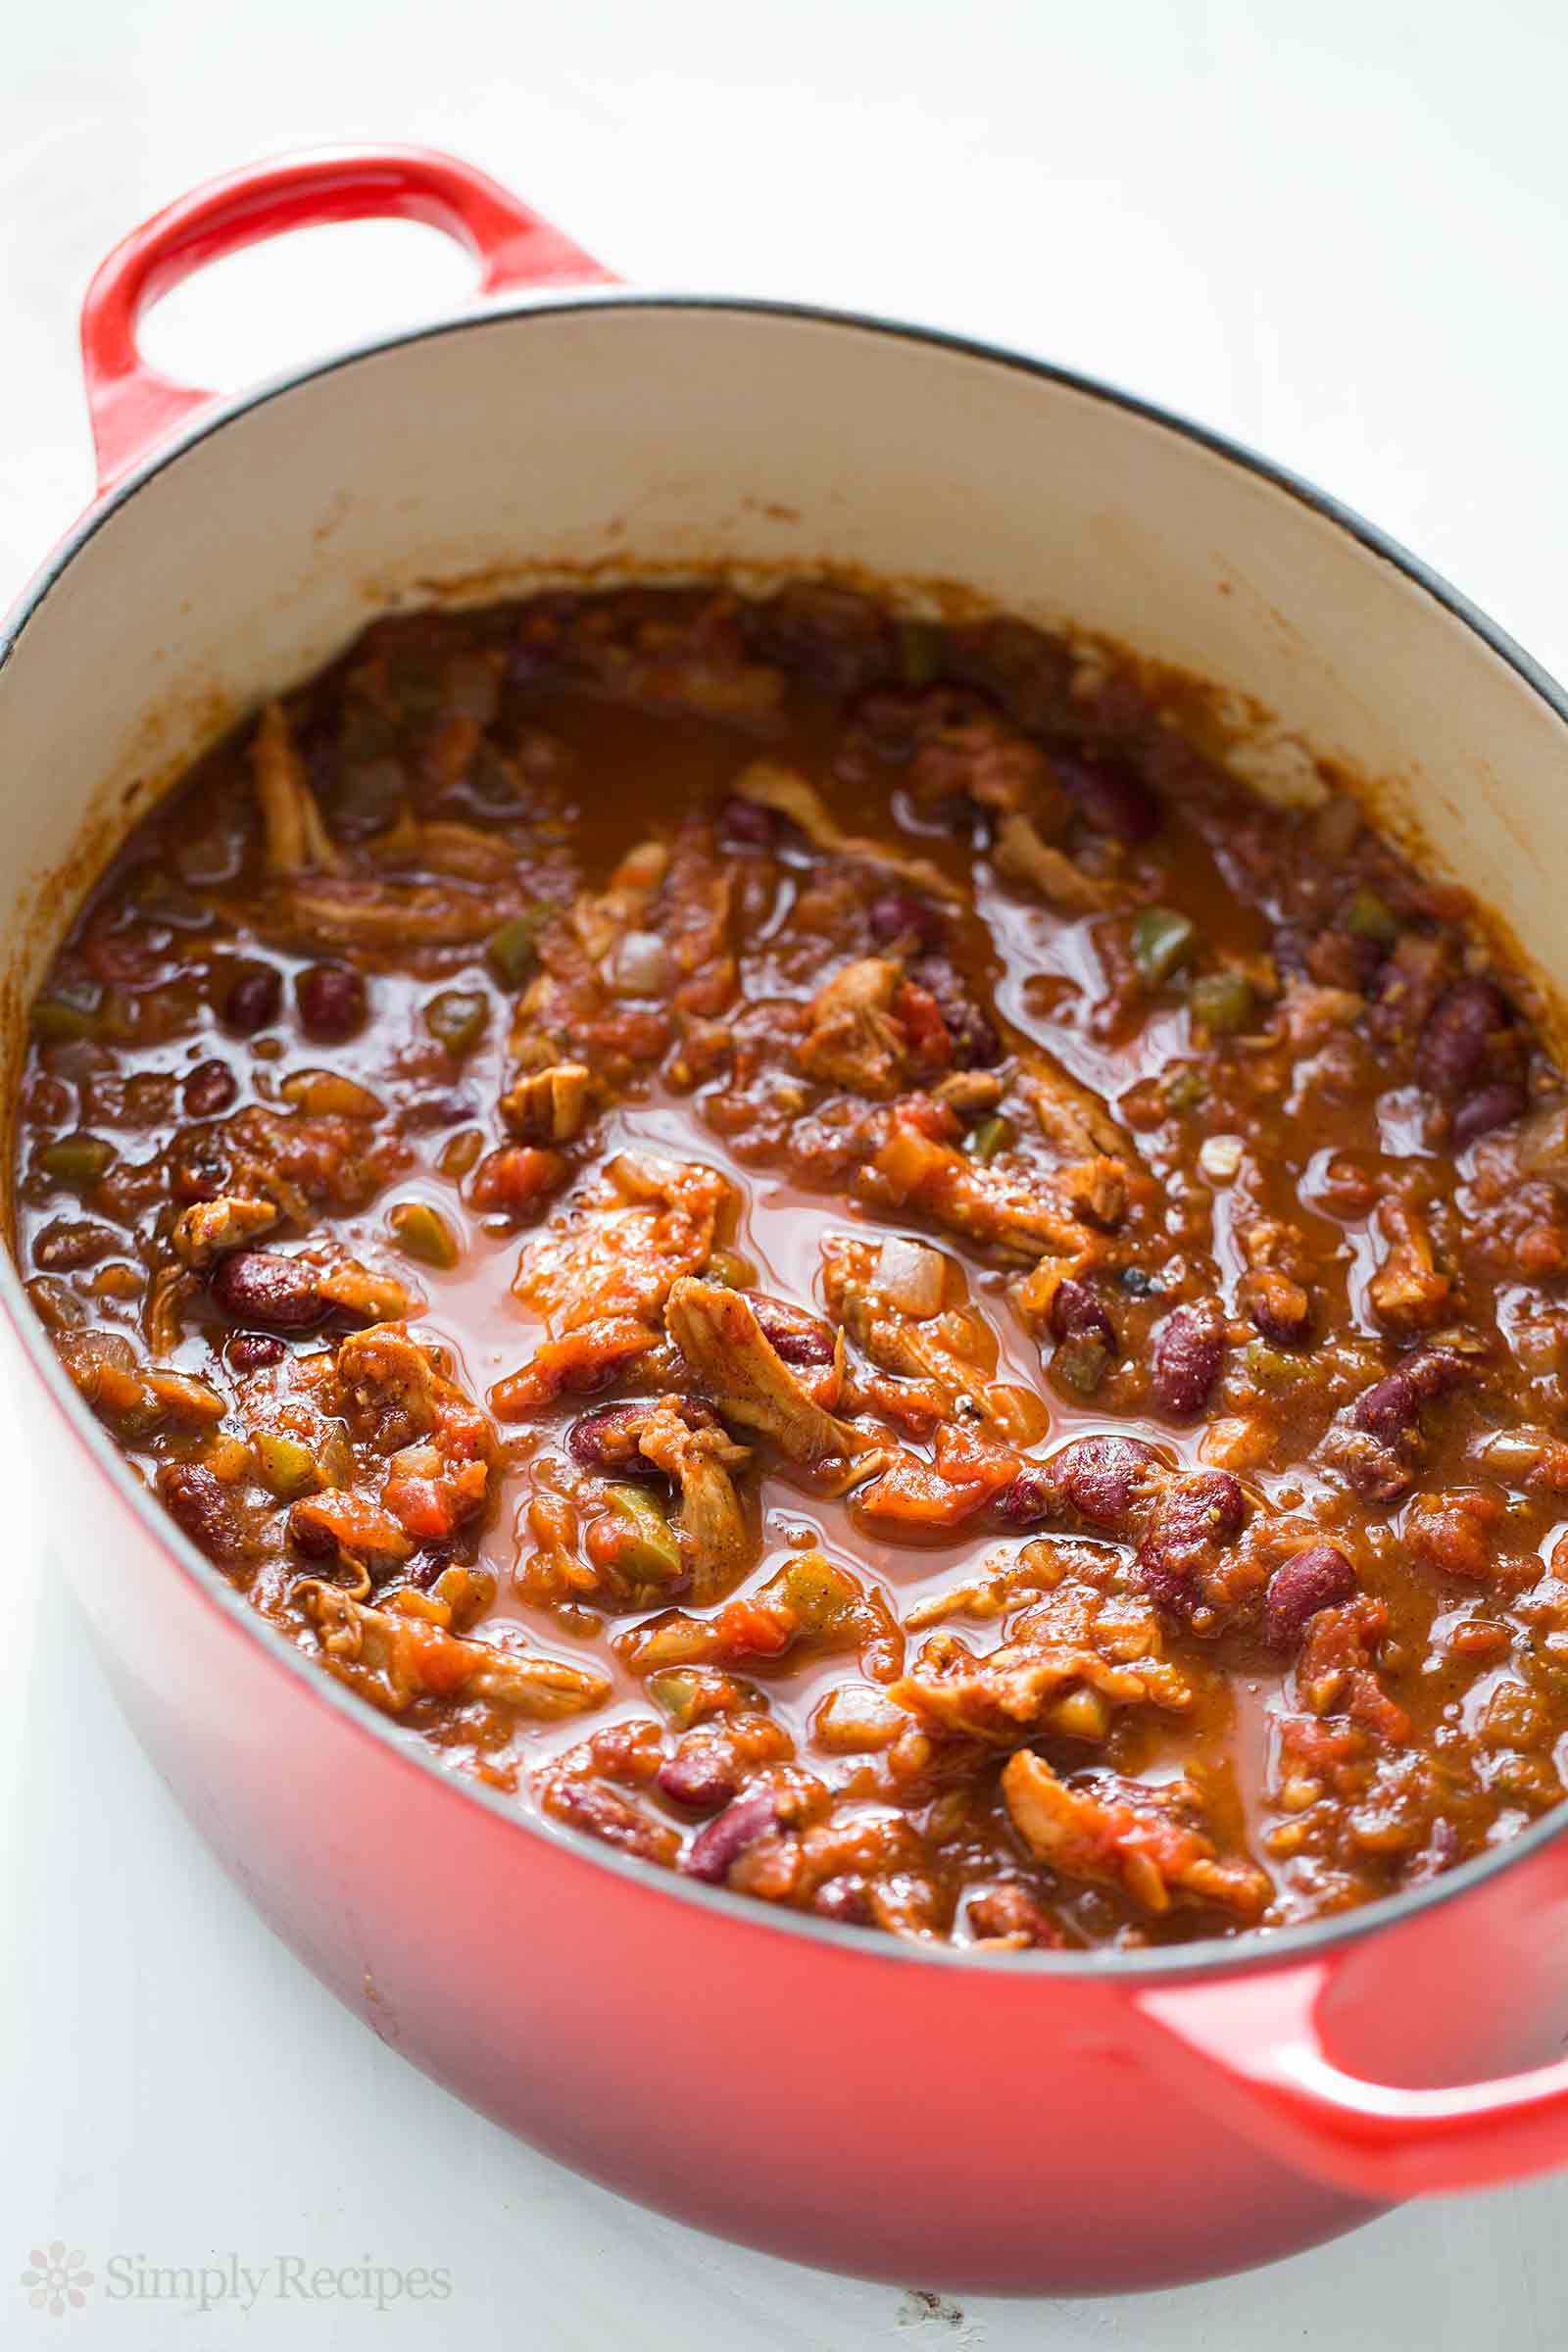 Turkey Chili Recipes  Turkey Chili with Leftover Turkey Recipe